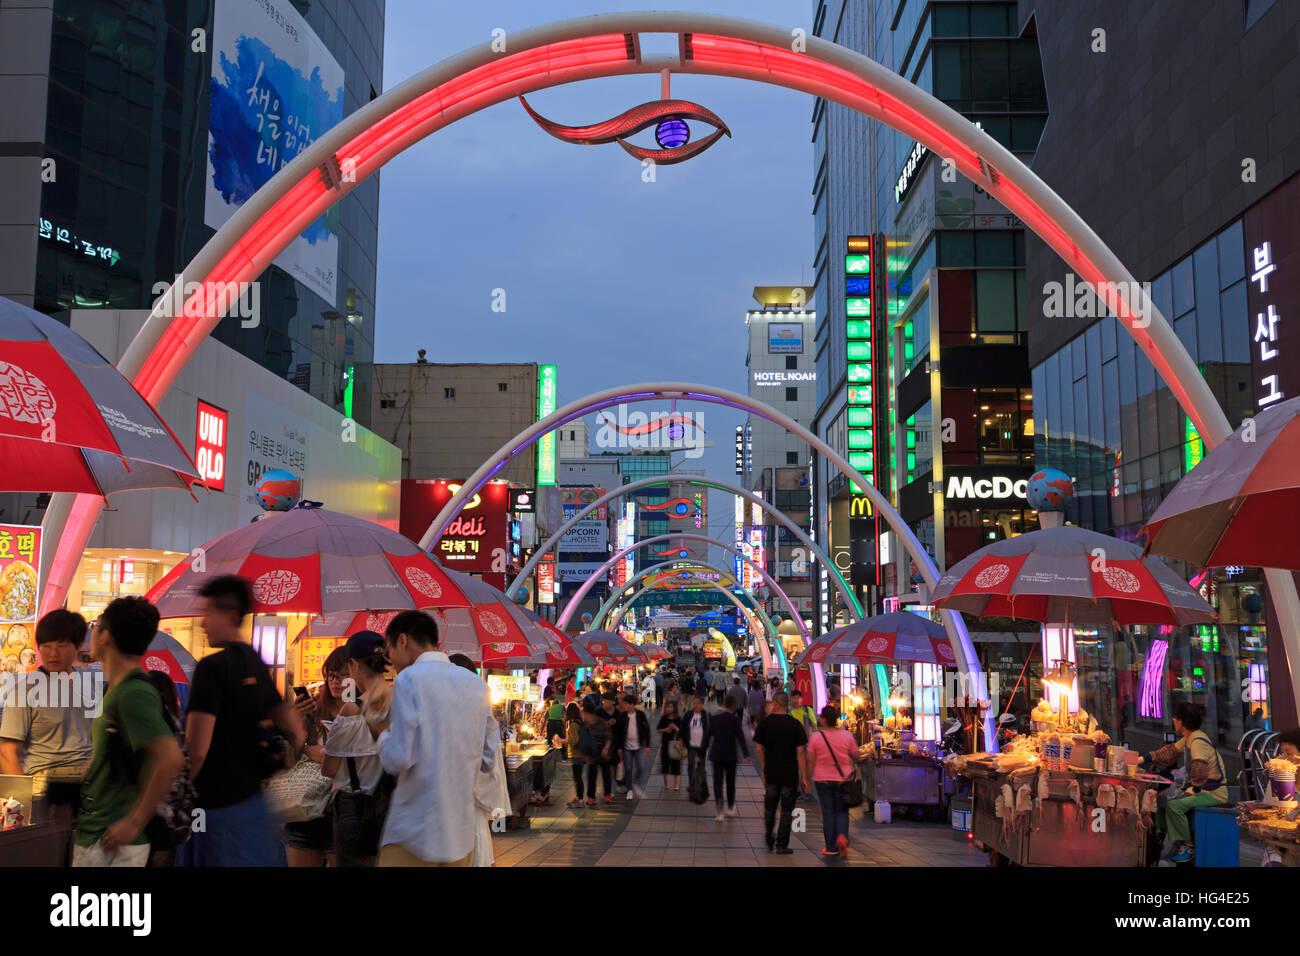 BIFF Square, el distrito de Nampo, Busan, Corea del Sur, Asia Imagen De Stock